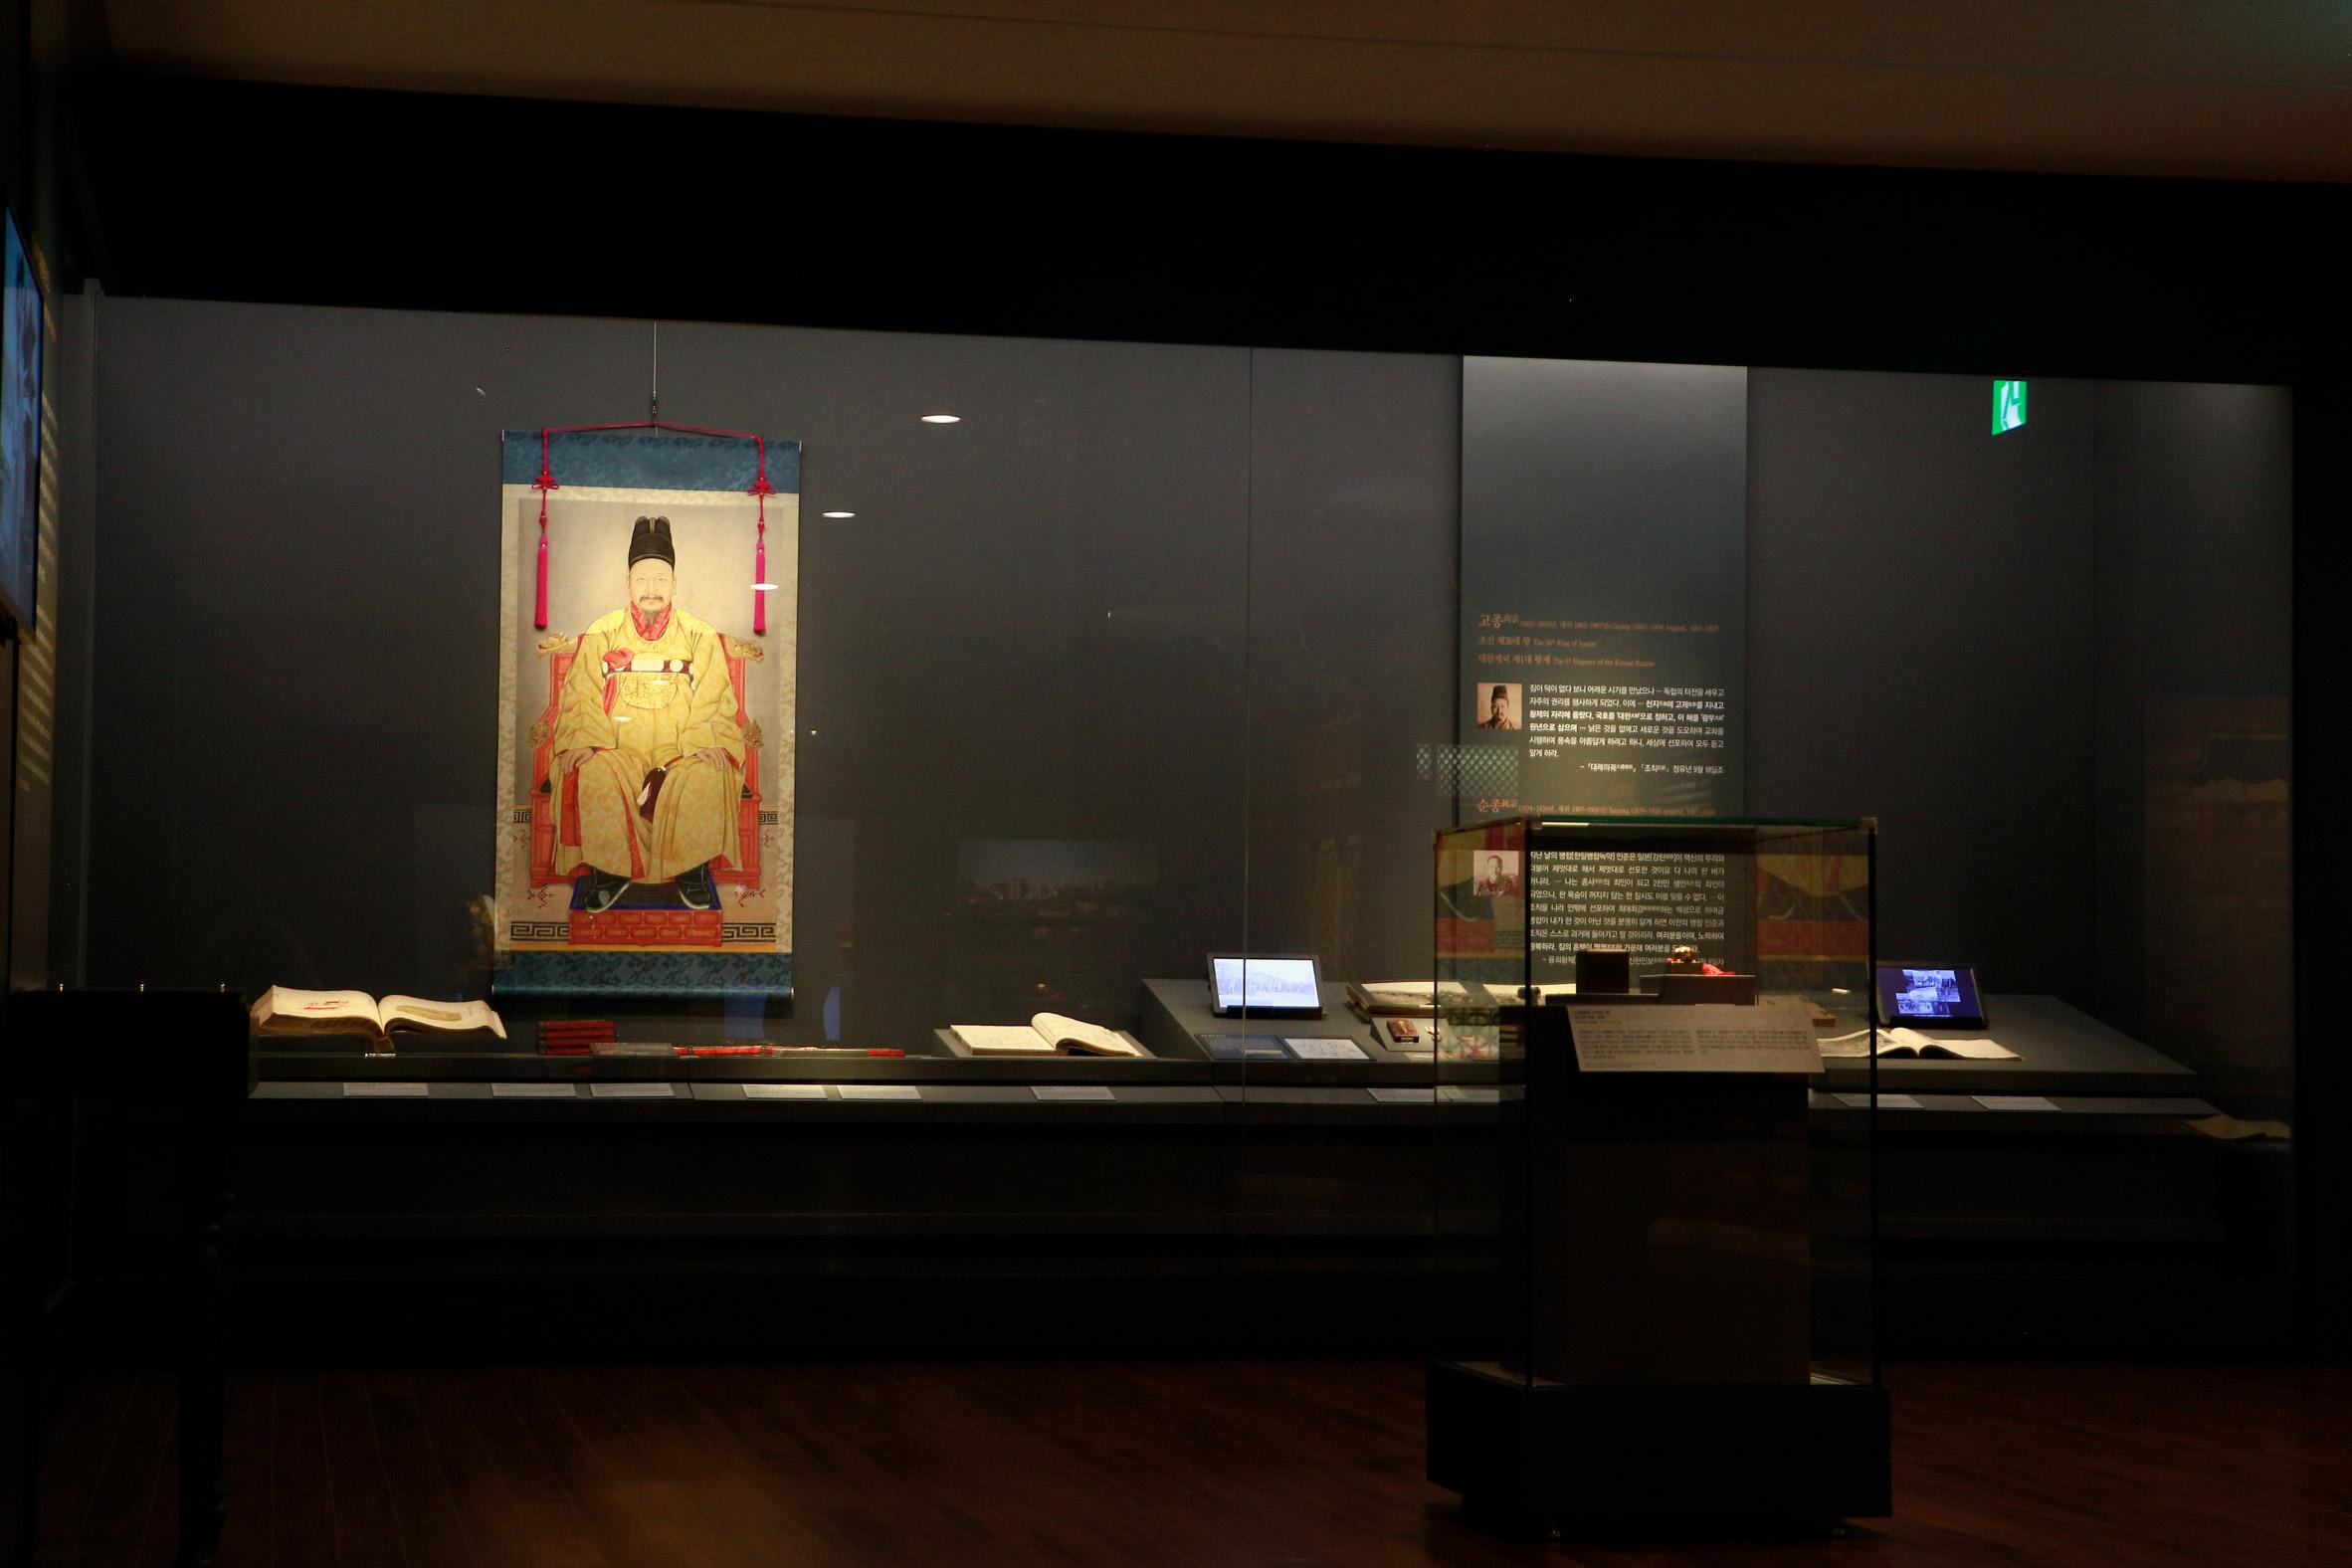 LG Display uses OLED lighting to transform galleries inside